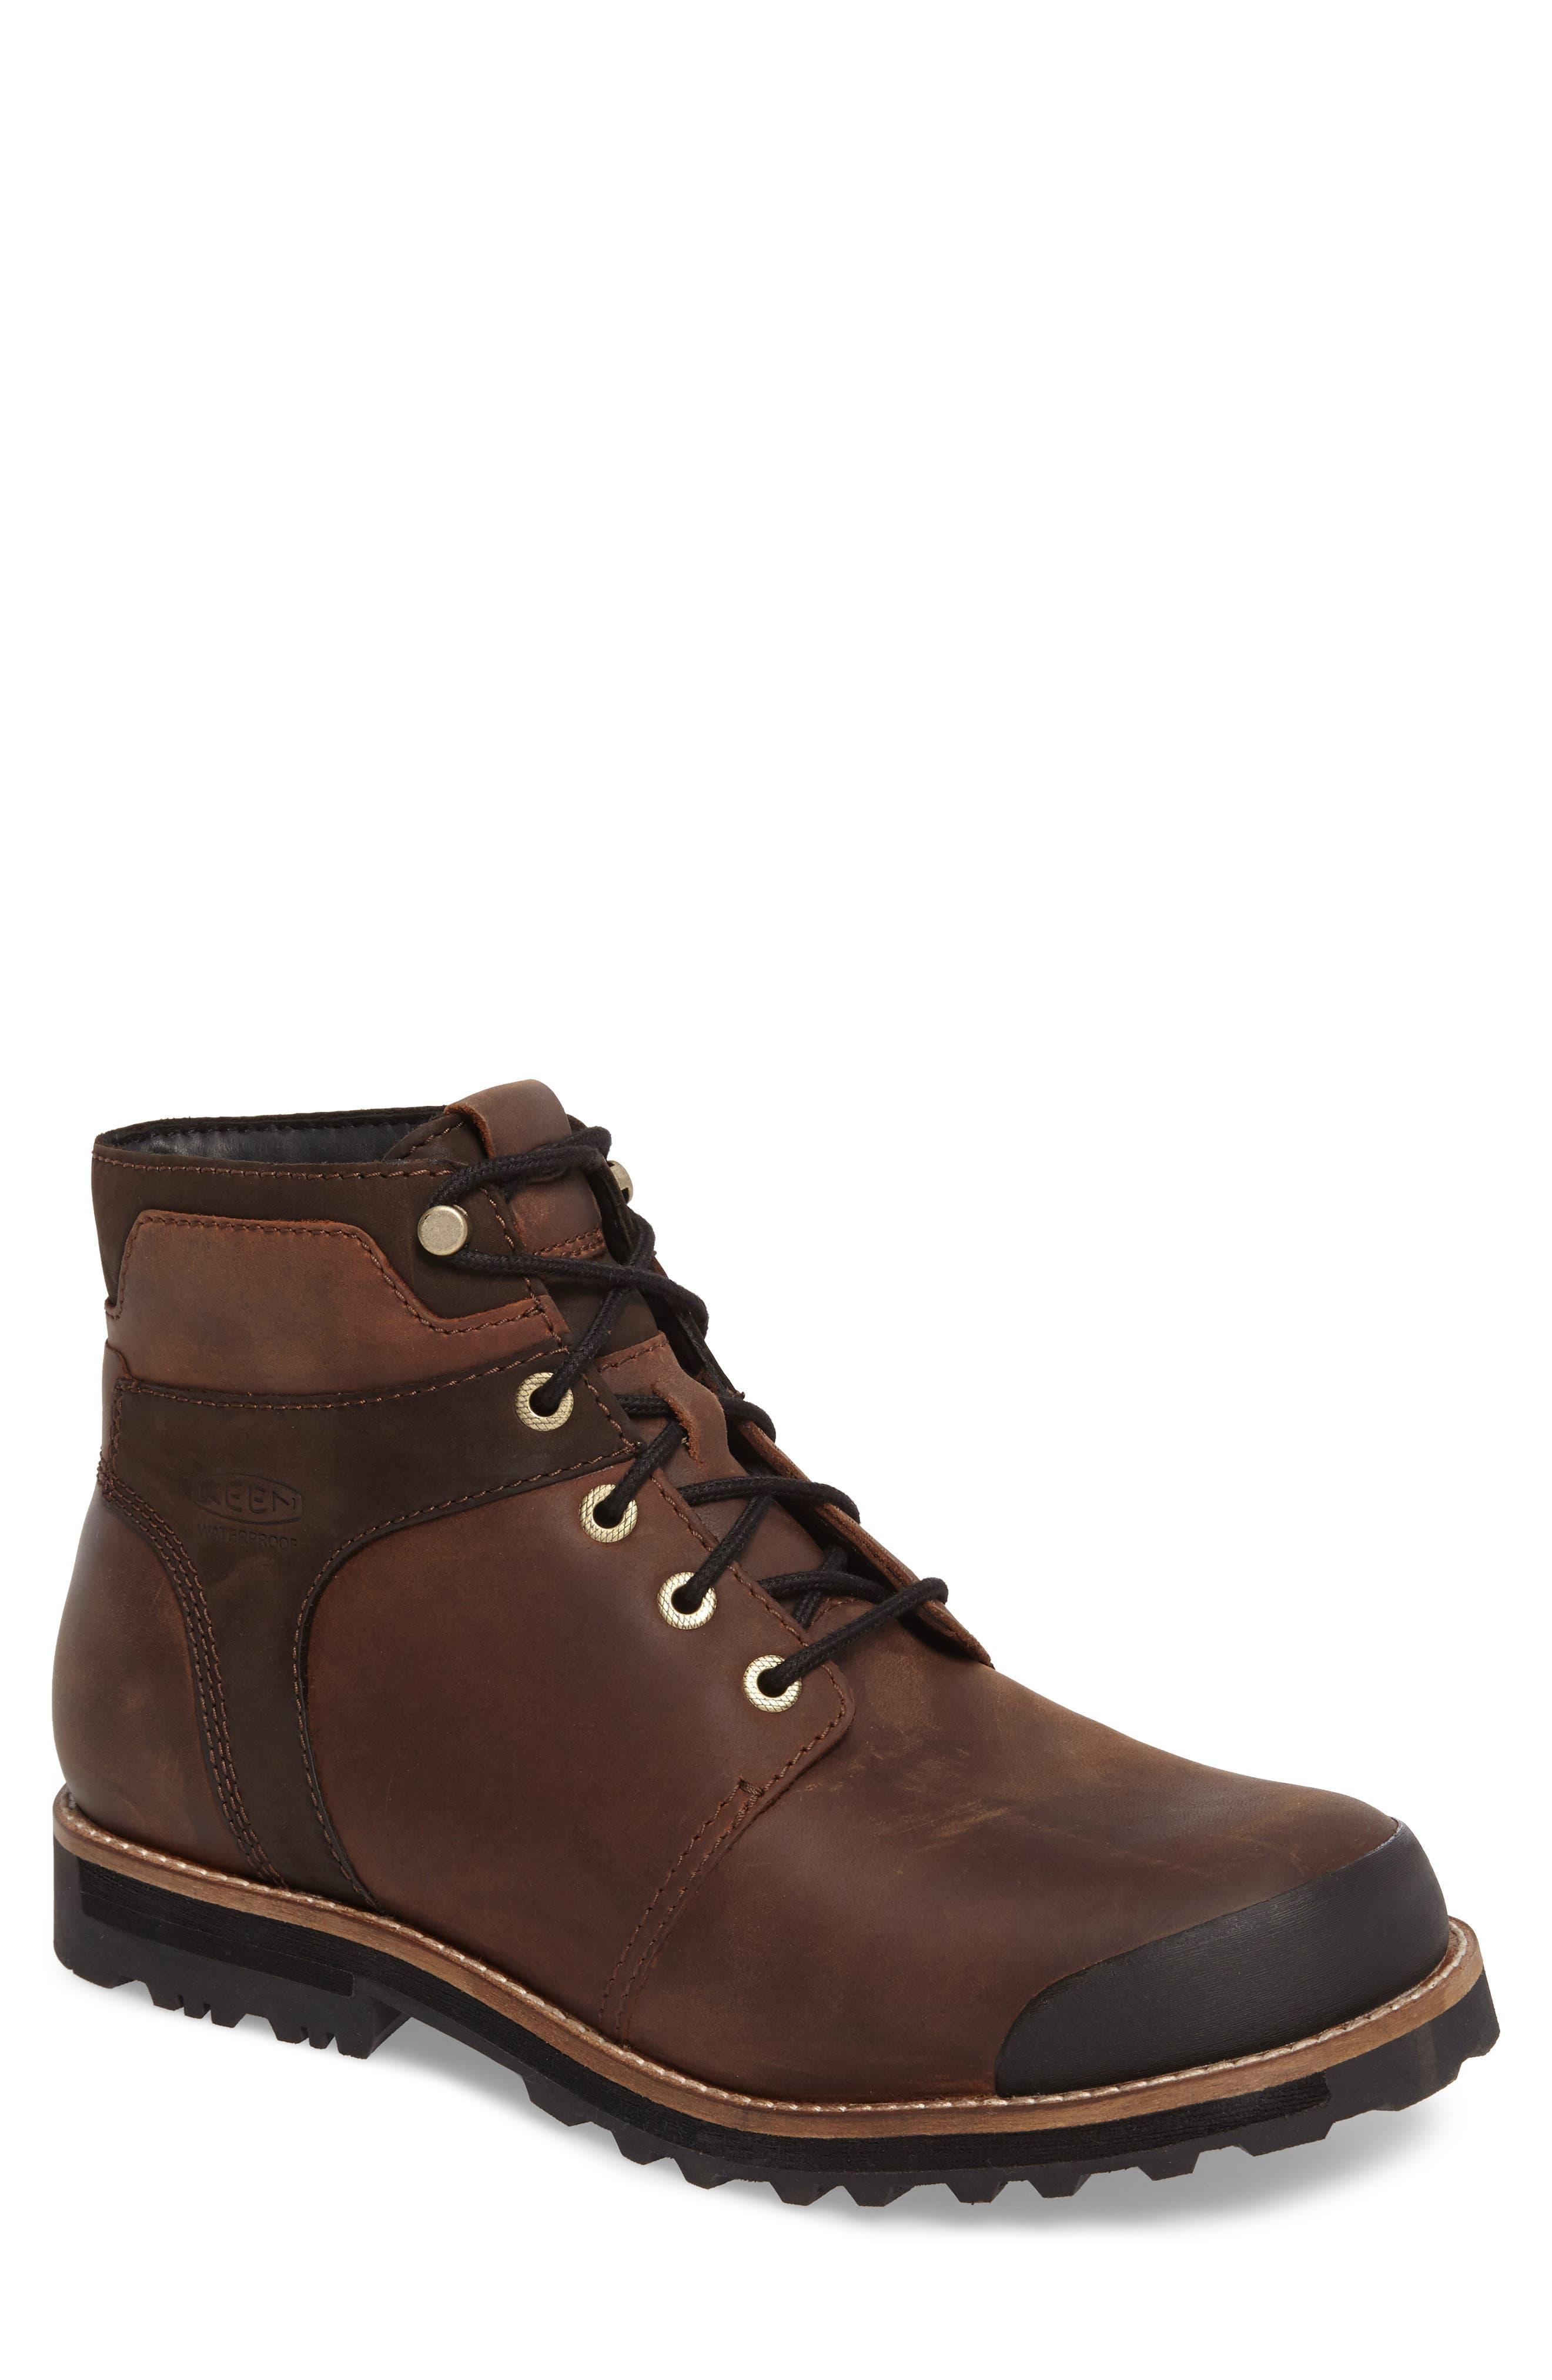 The Rocker Waterproof Plain Toe Boot,                         Main,                         color, BIG BEN/ EIFFEL